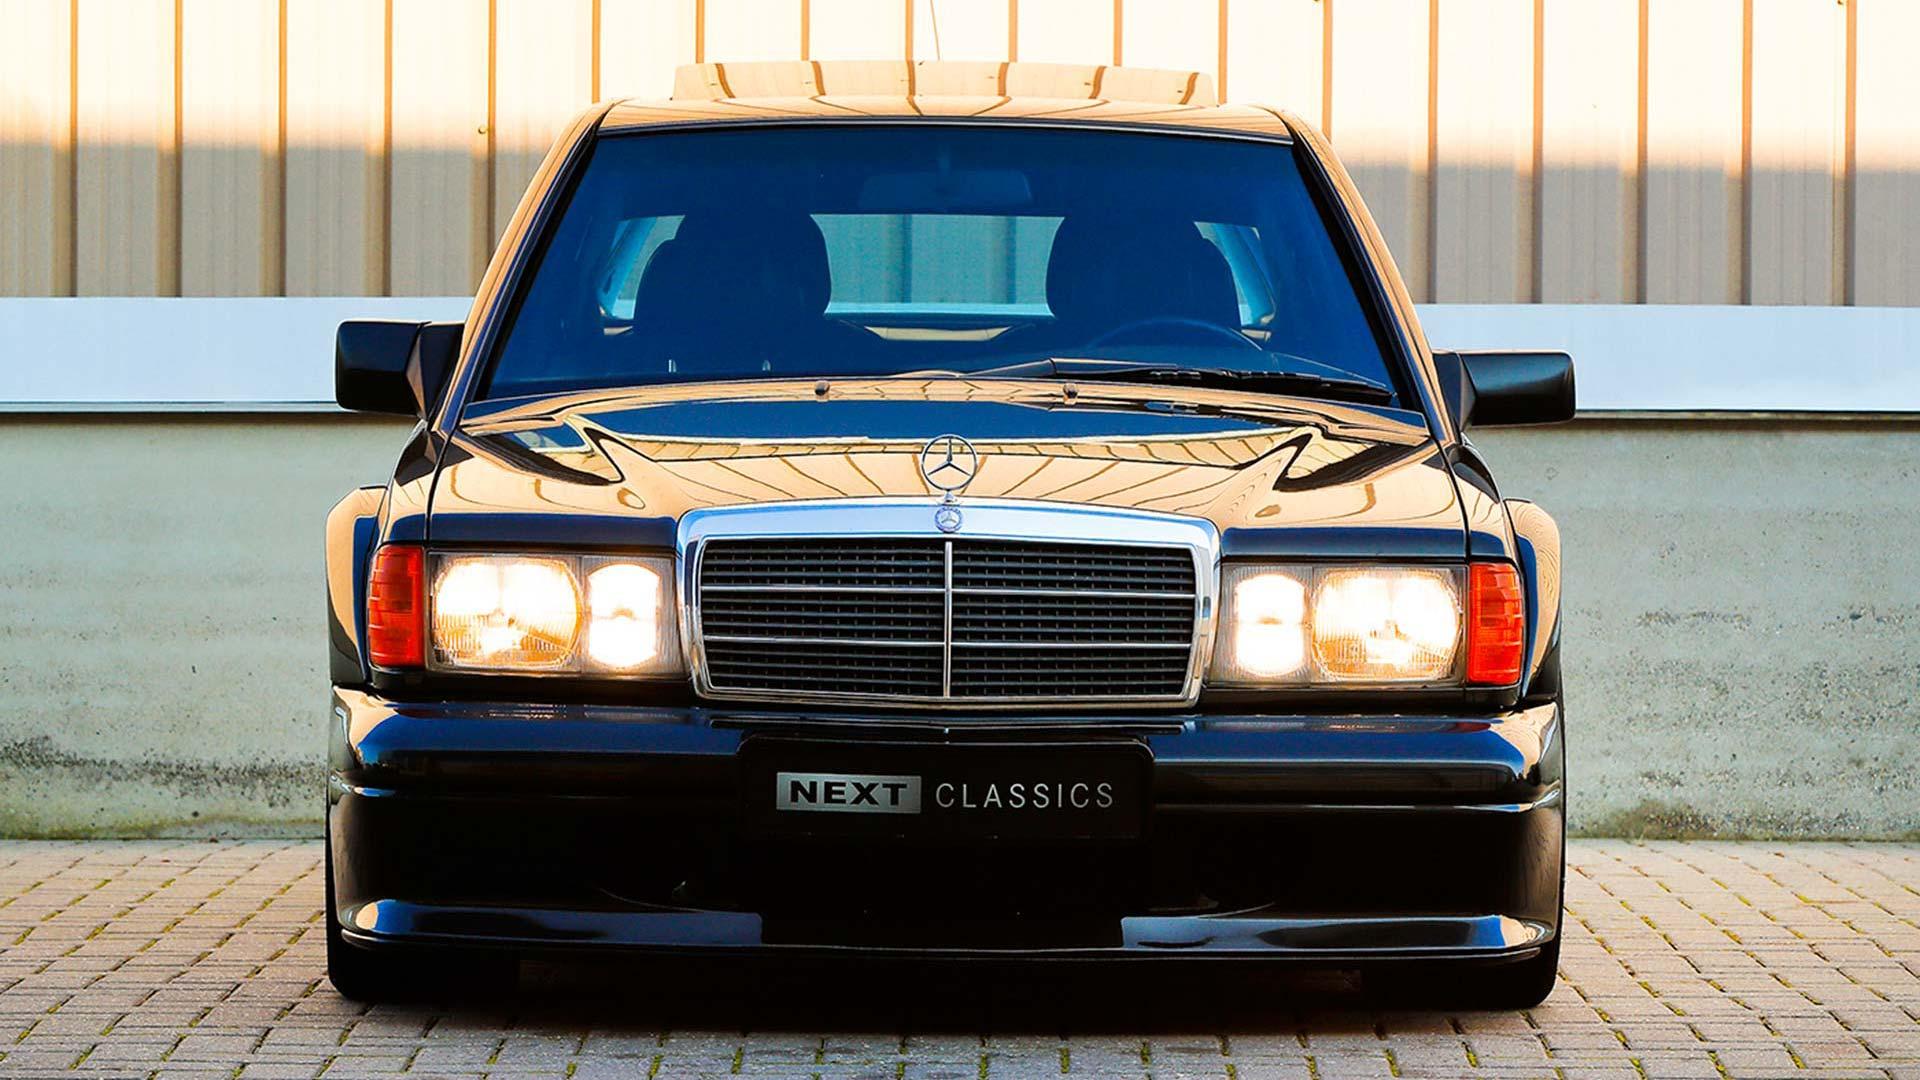 1990 Mercedes Benz 190E Evo II